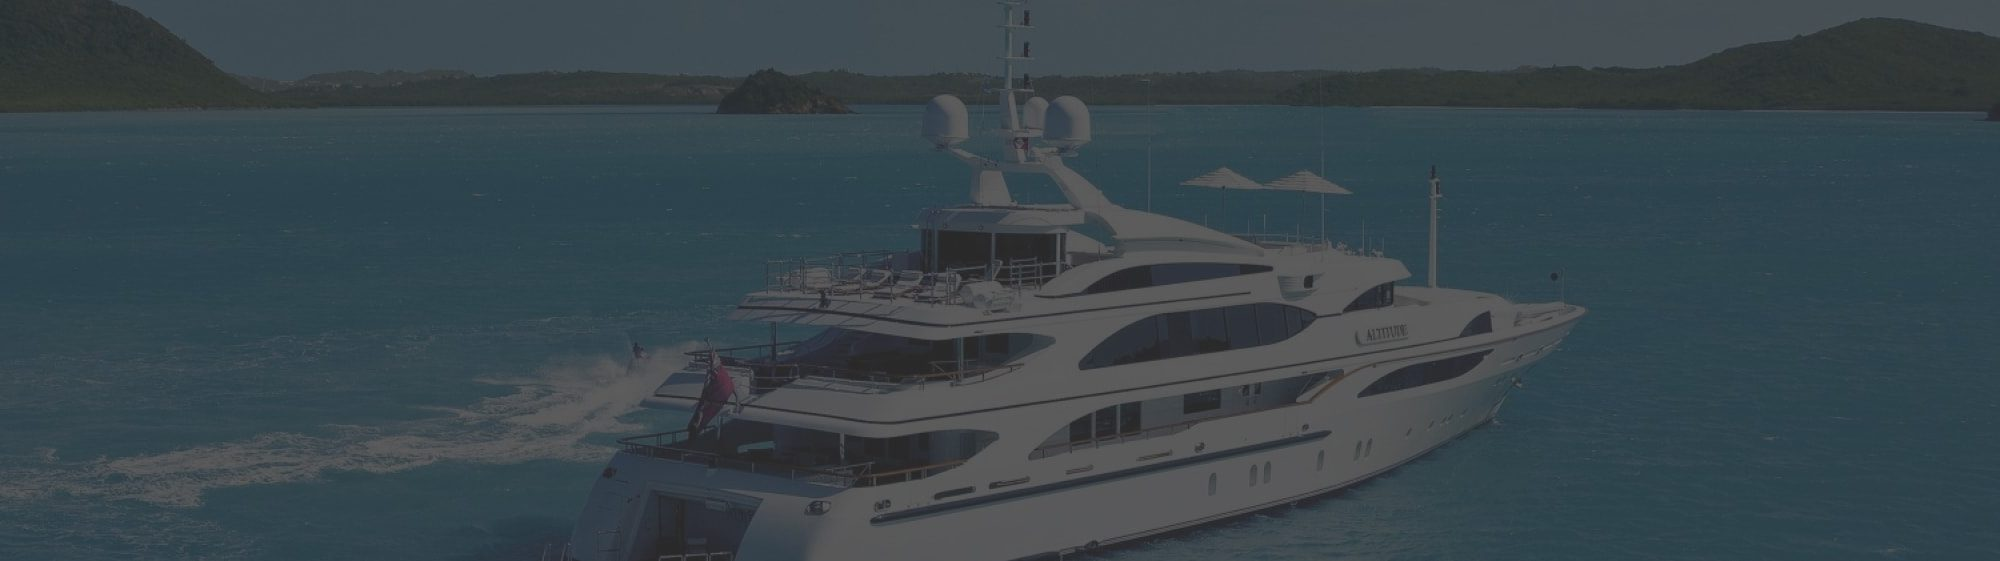 anyboat_banner